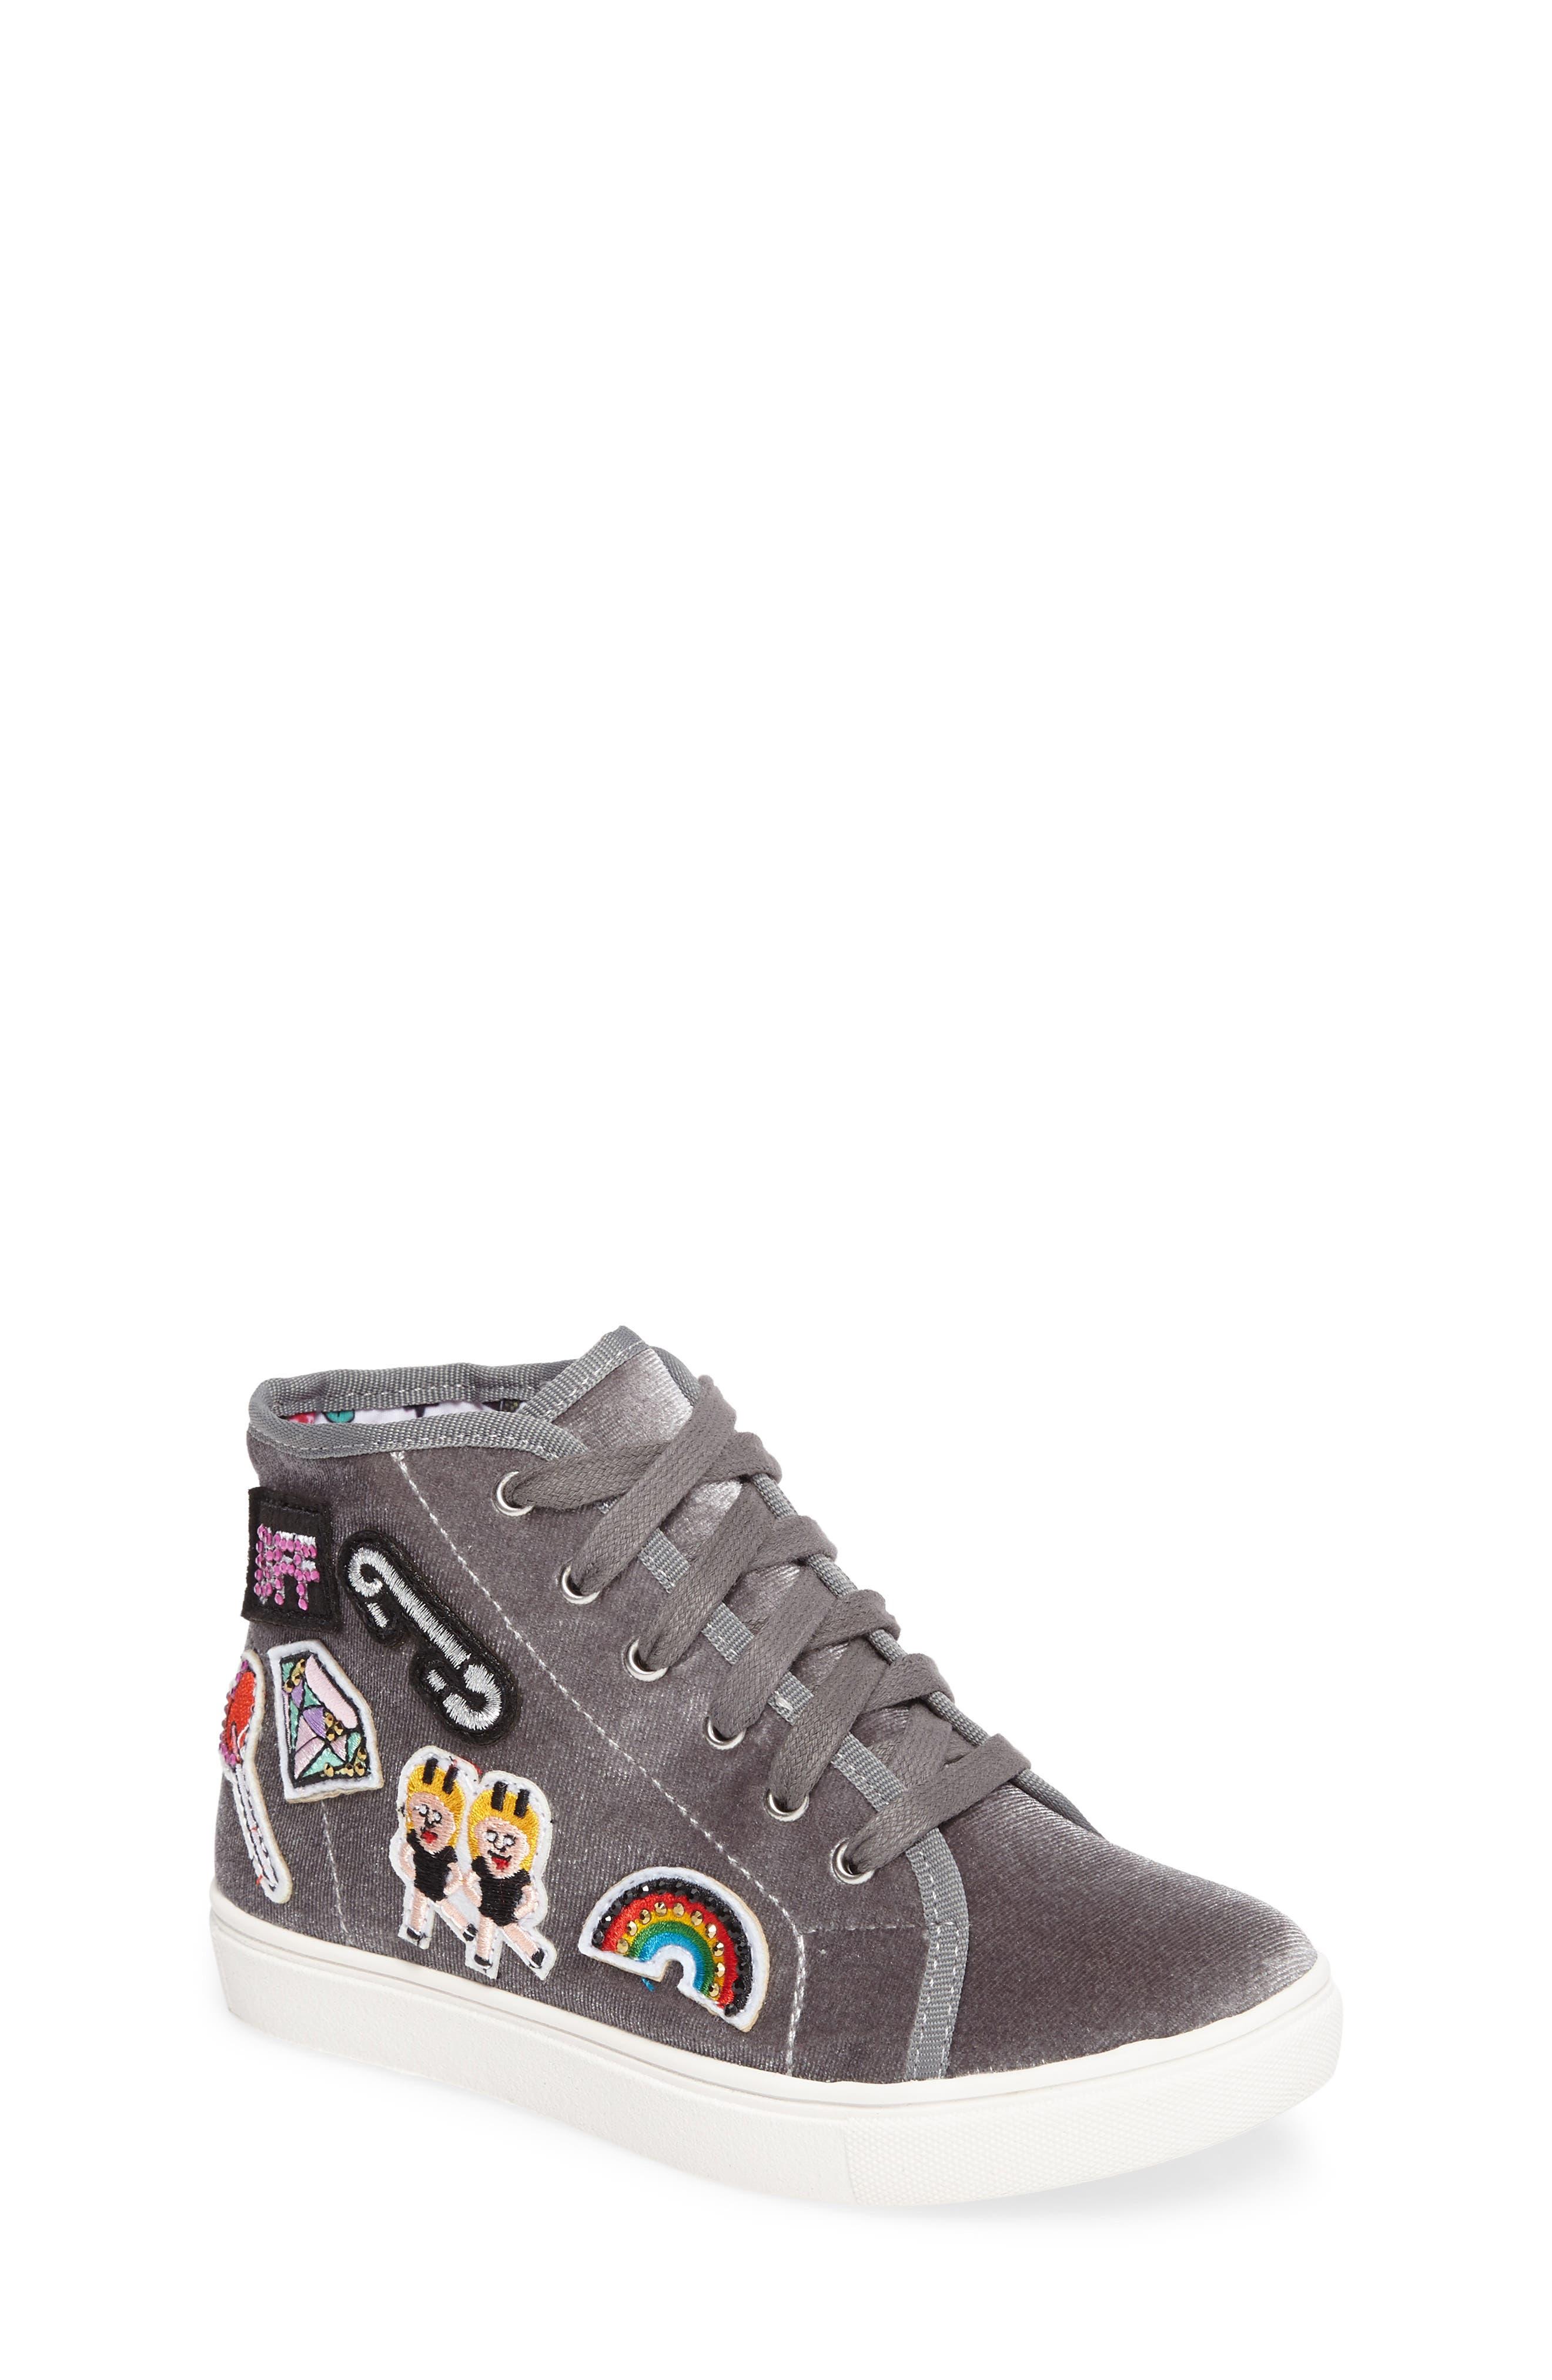 J-BFF High Top Sneaker,                             Main thumbnail 1, color,                             055